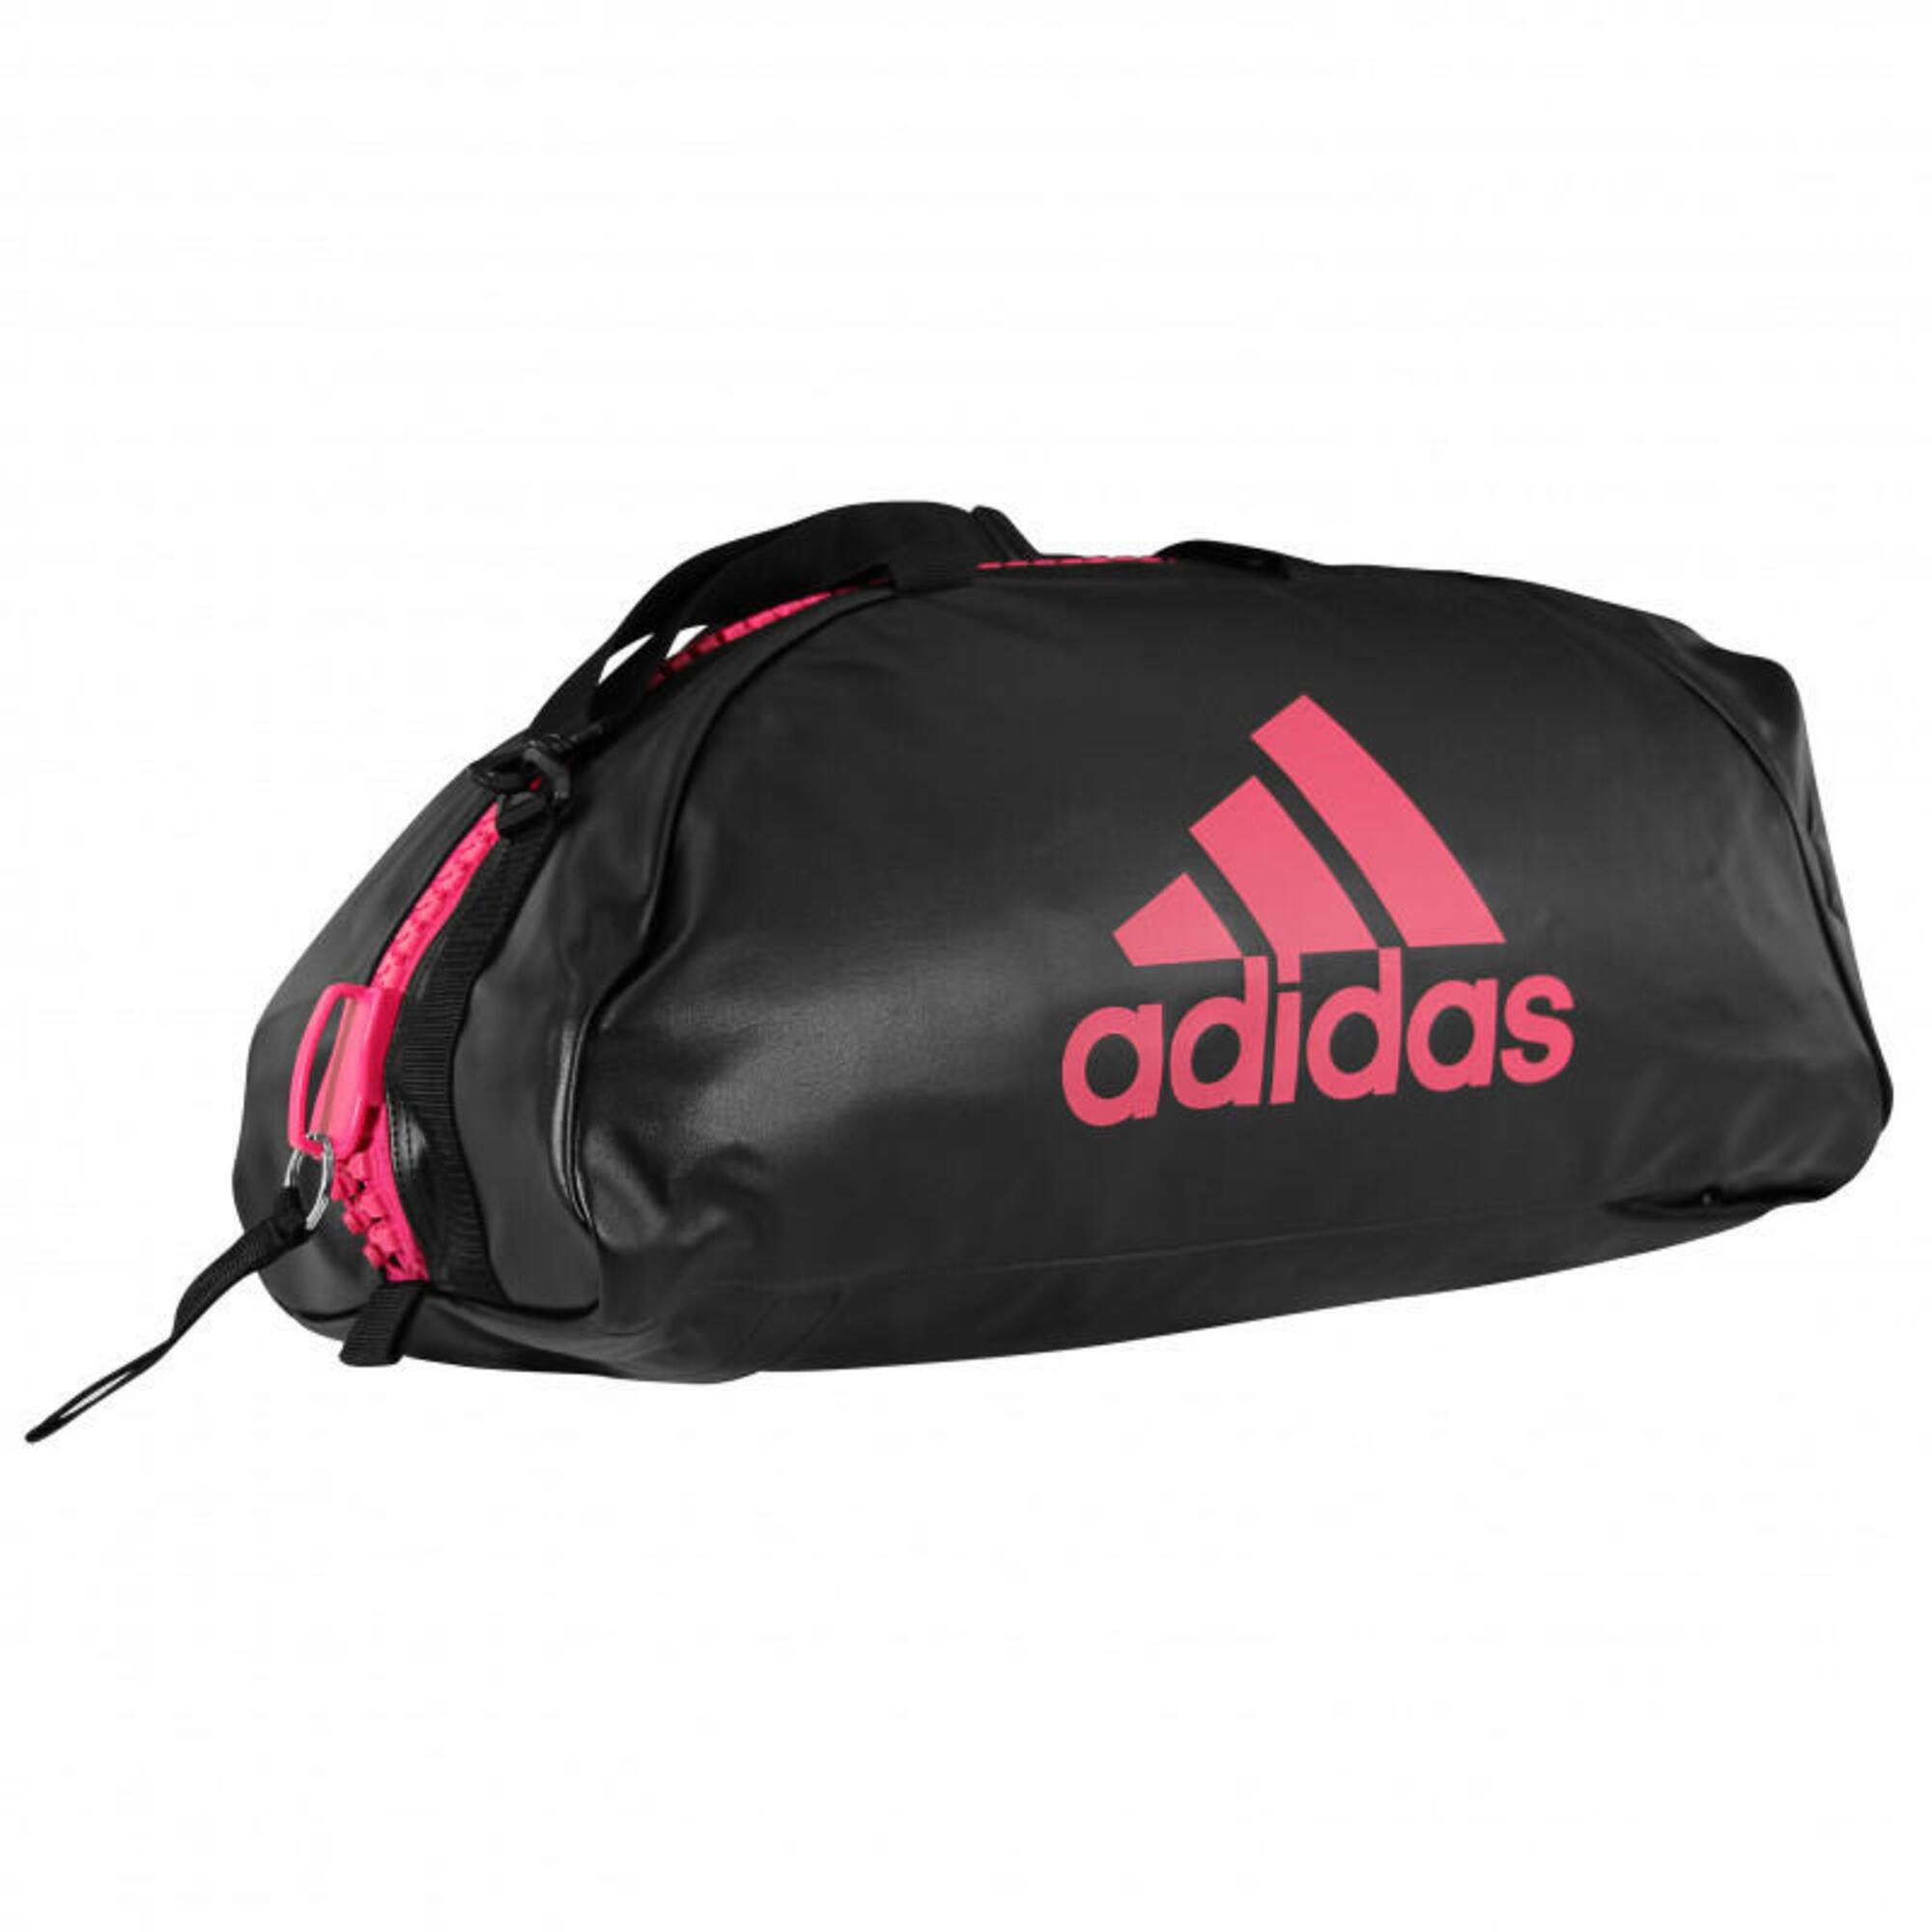 Sac de sport Adidas 2 en 1 logo Rose